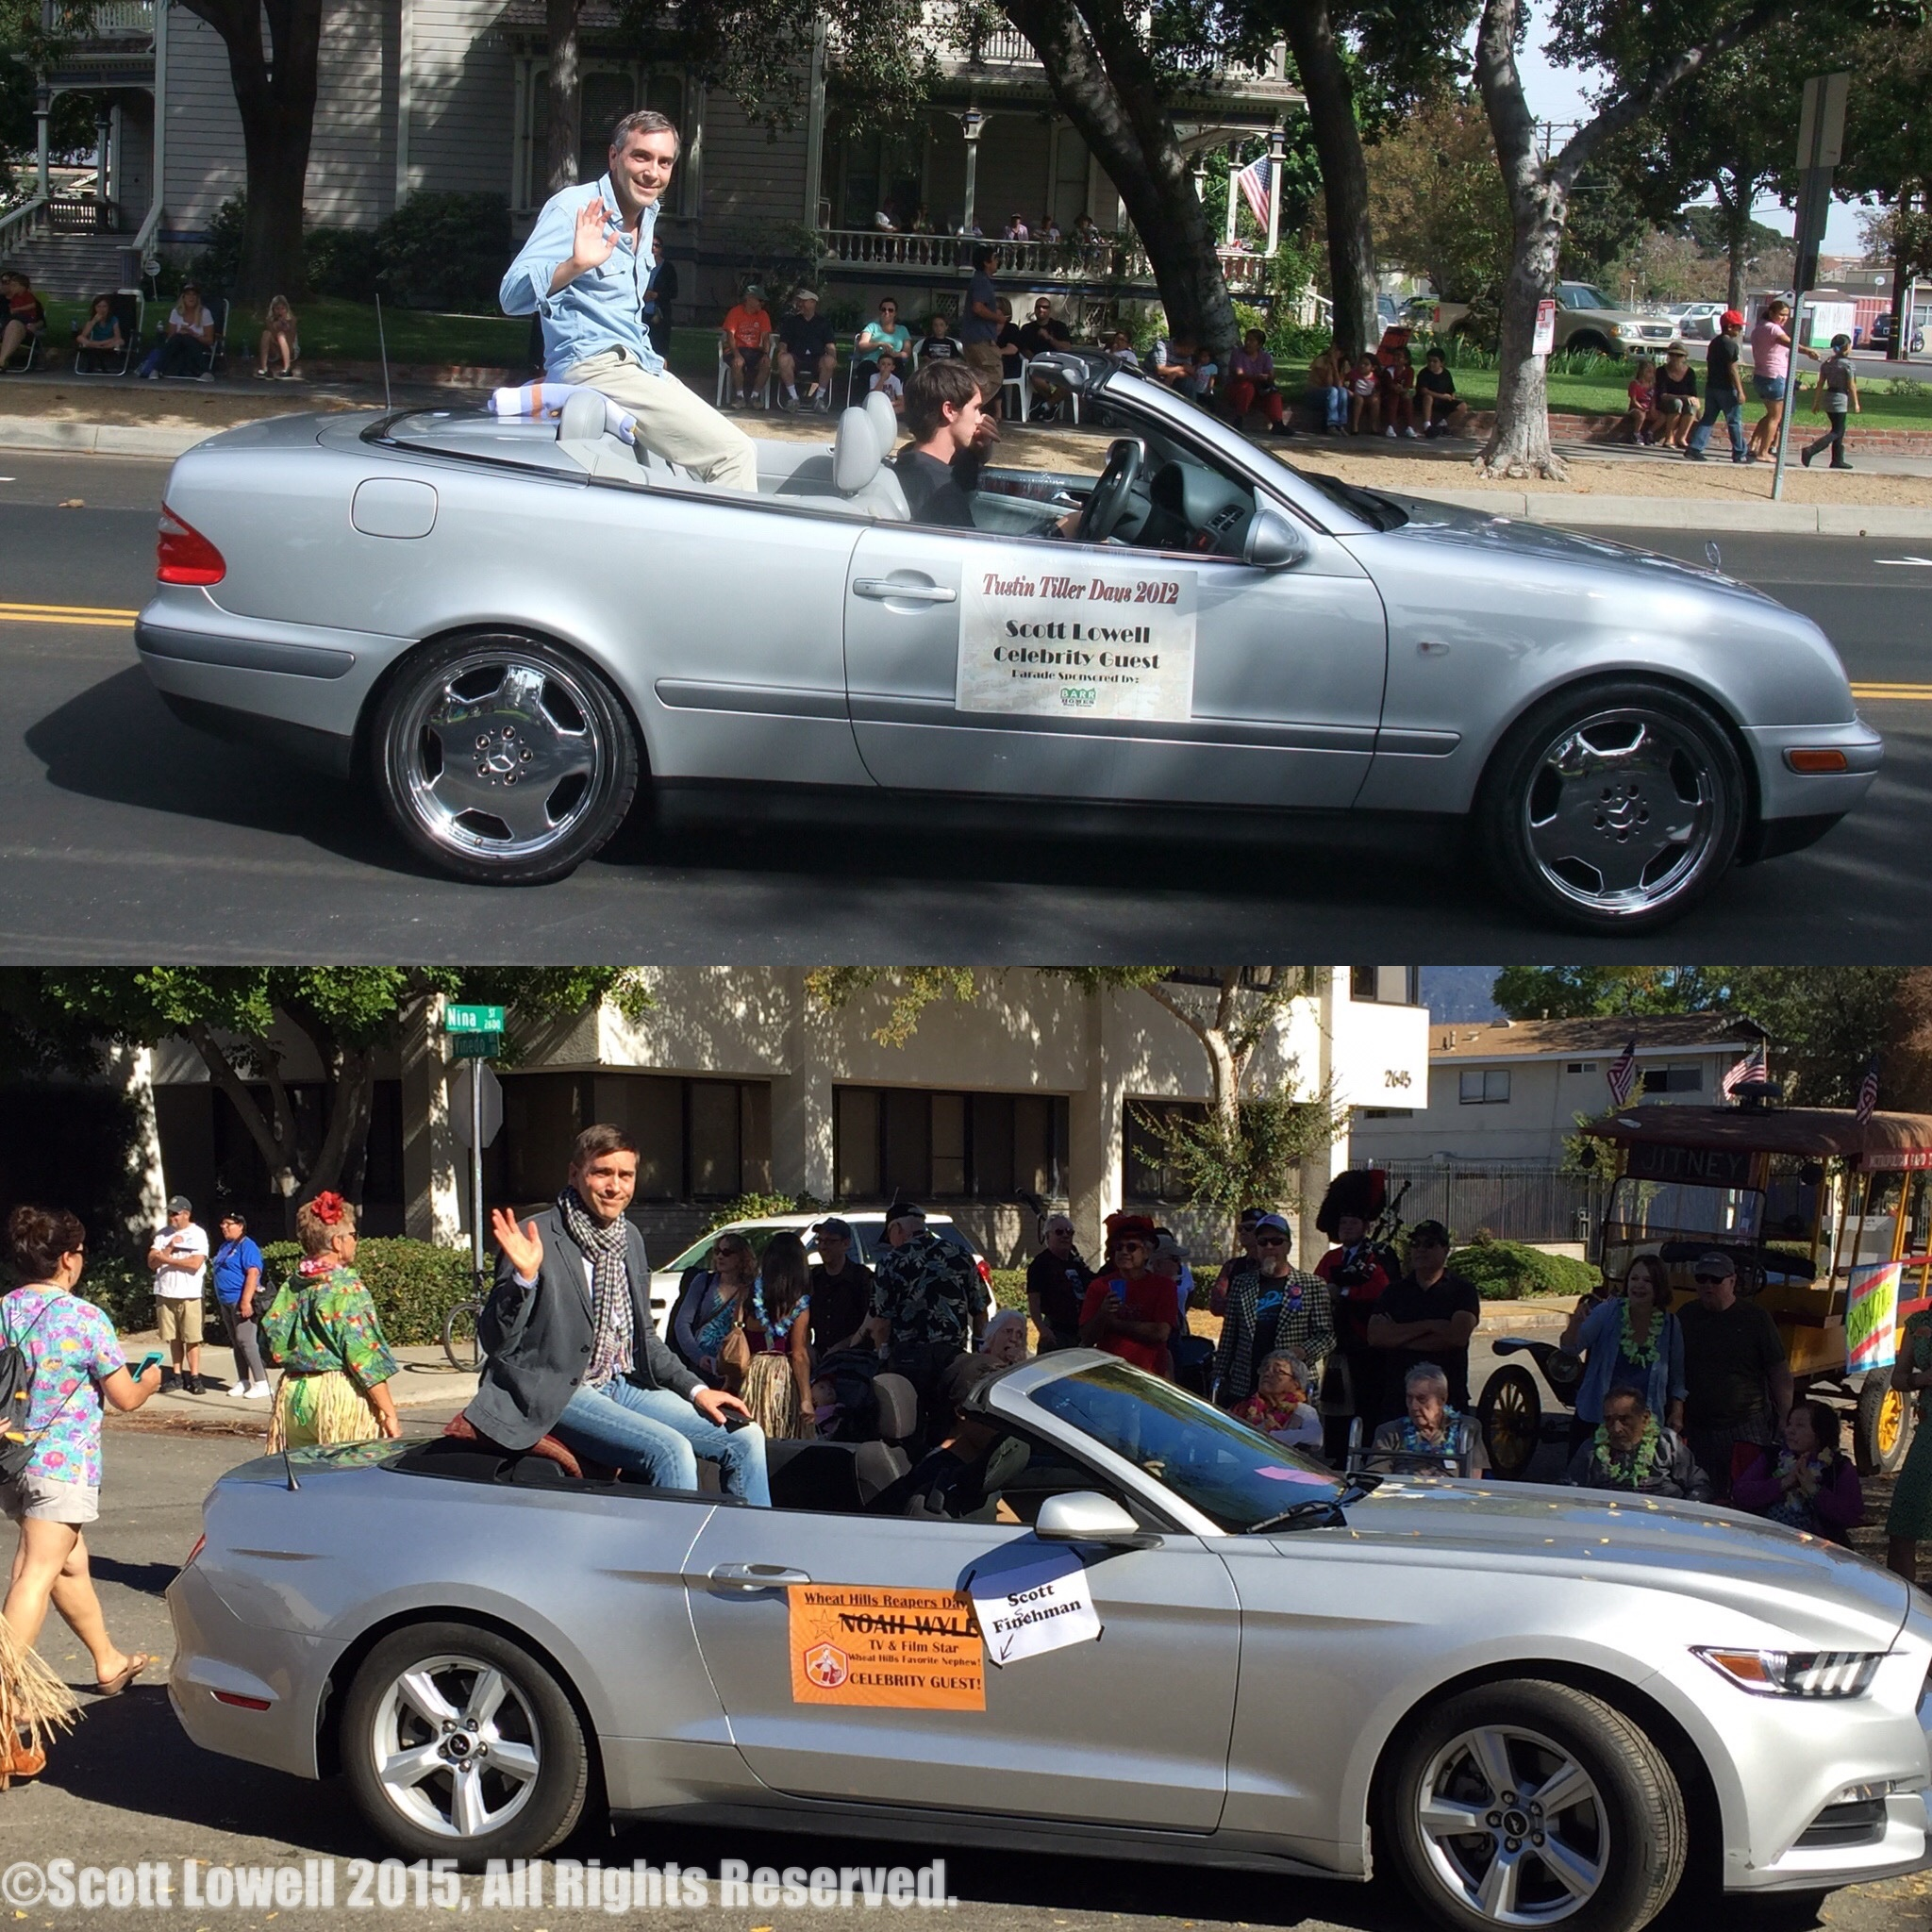 "11/22/15 Parade Scene. Reality vs. Fantasy. Scott Lowell at Tustin Tiller Days Parade 2012, ""Scott Fishman"" at Wheat Hills Reapers Day Parade 2015"